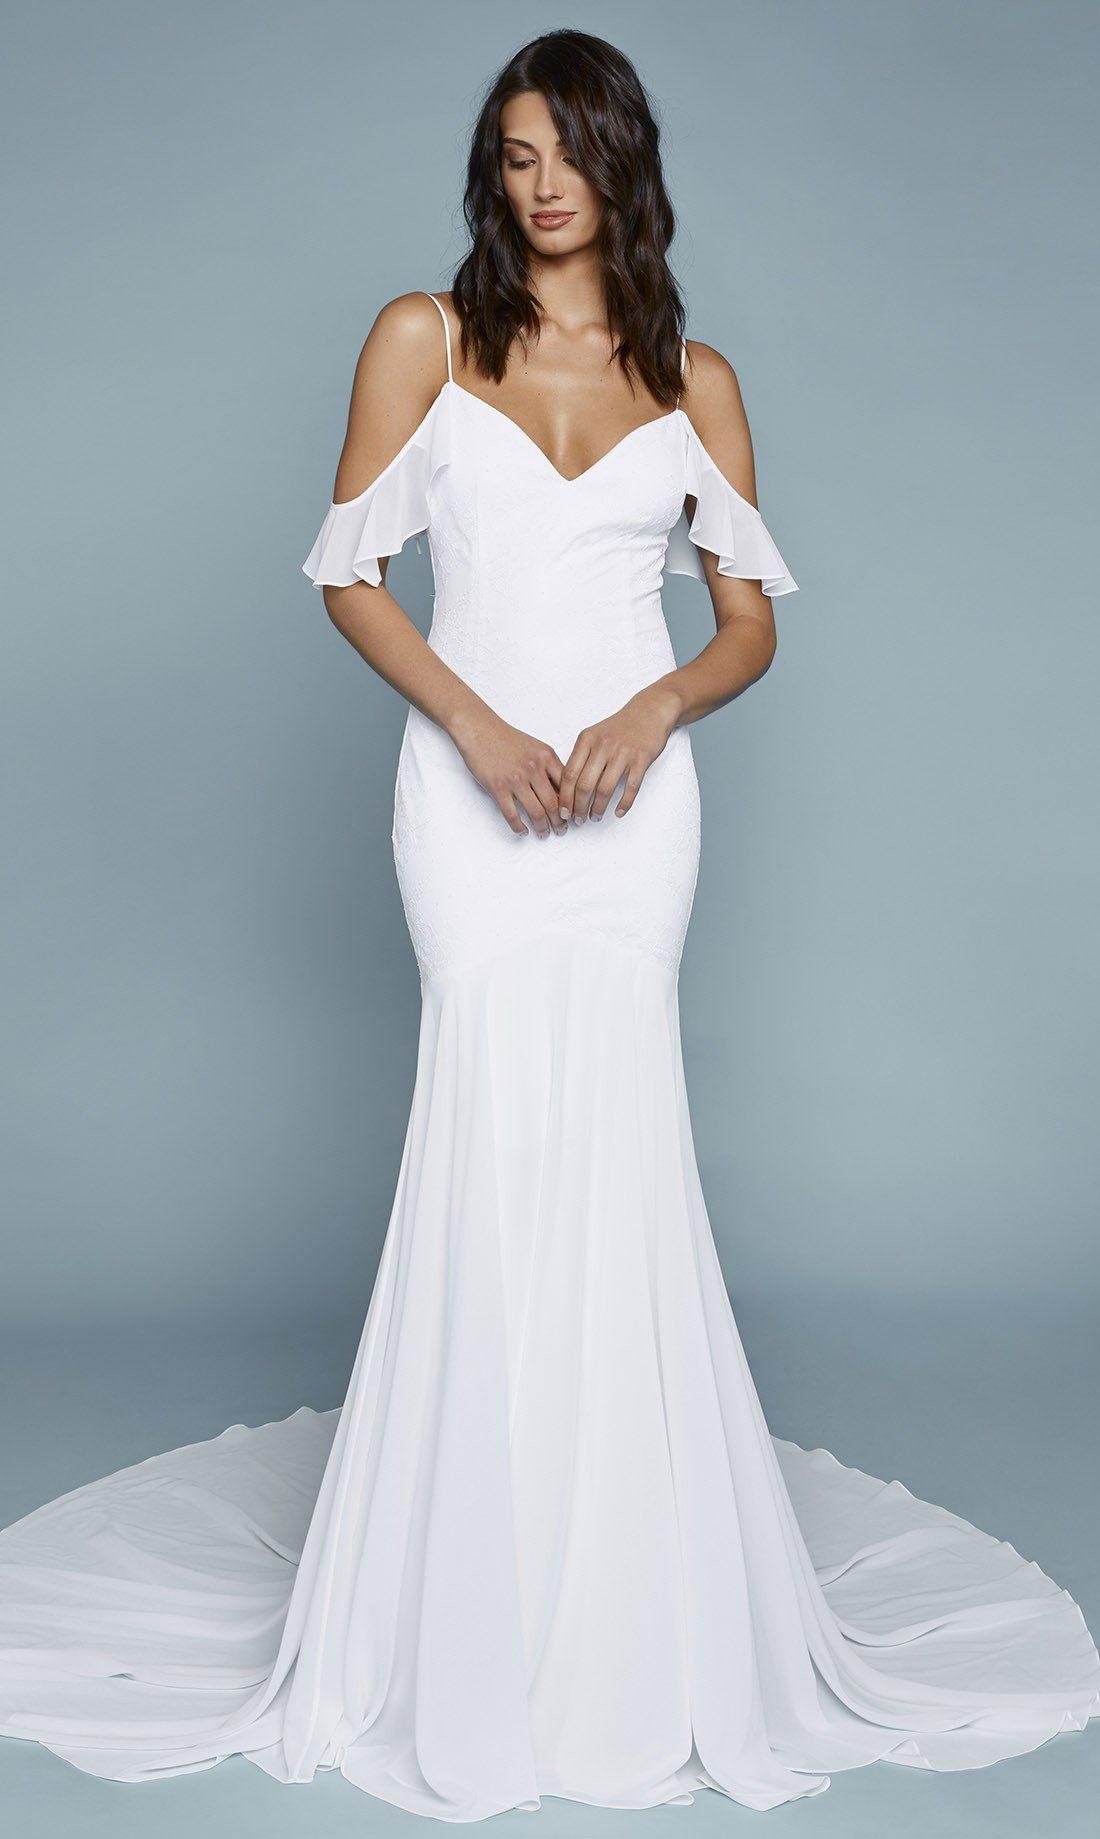 Luxury Wedding Dress With Camo Image - All Wedding Dresses ...